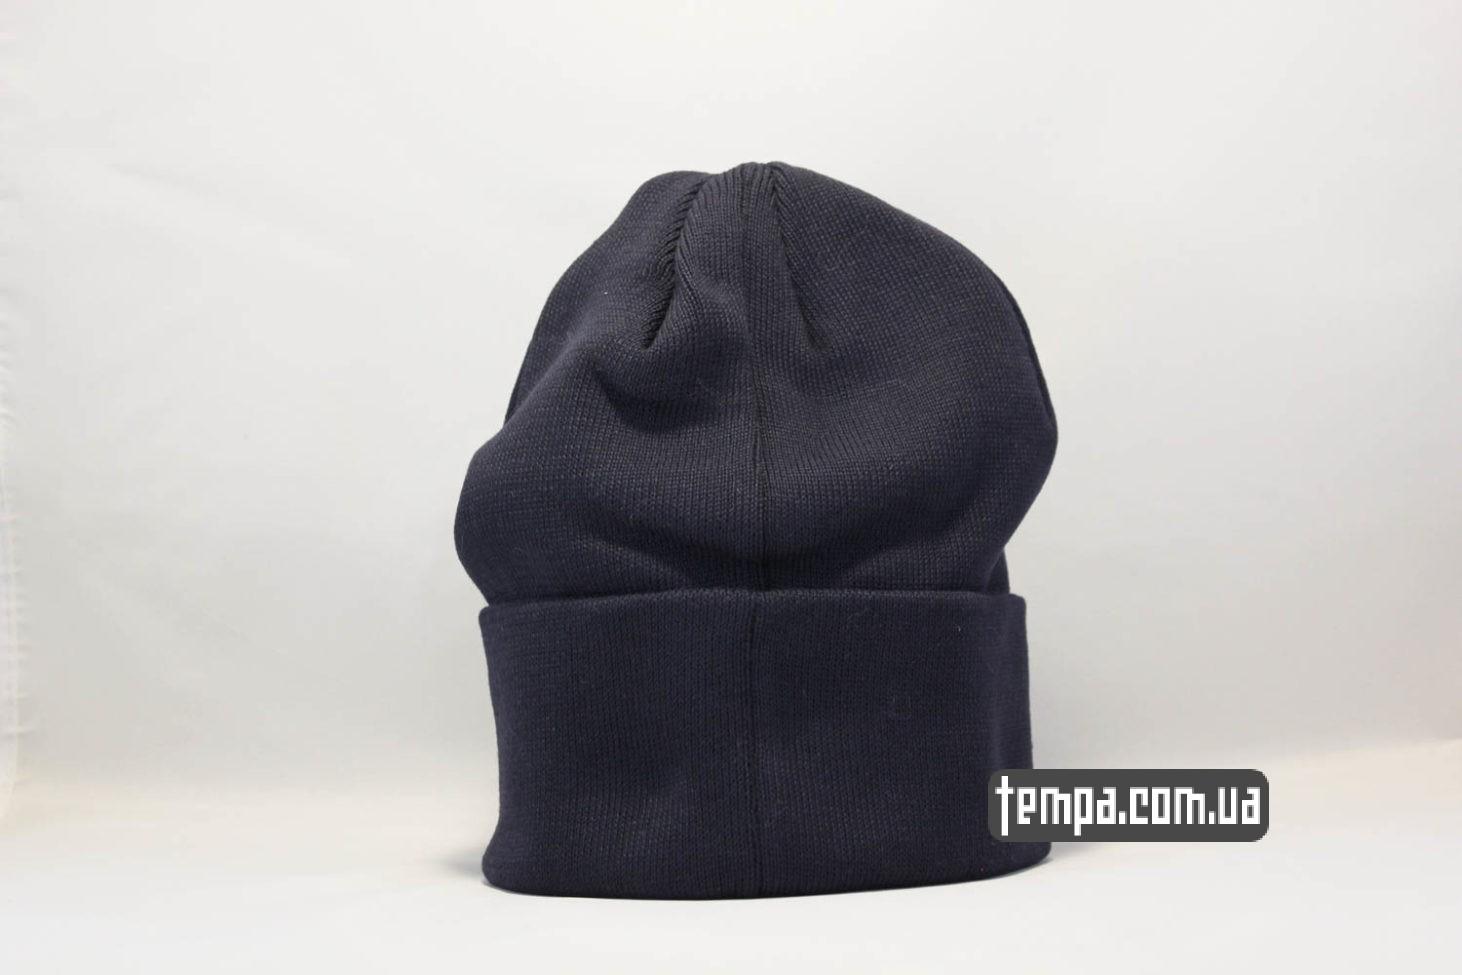 магазин шапок бини украина шапка beanie Dickies синяя купить Украина